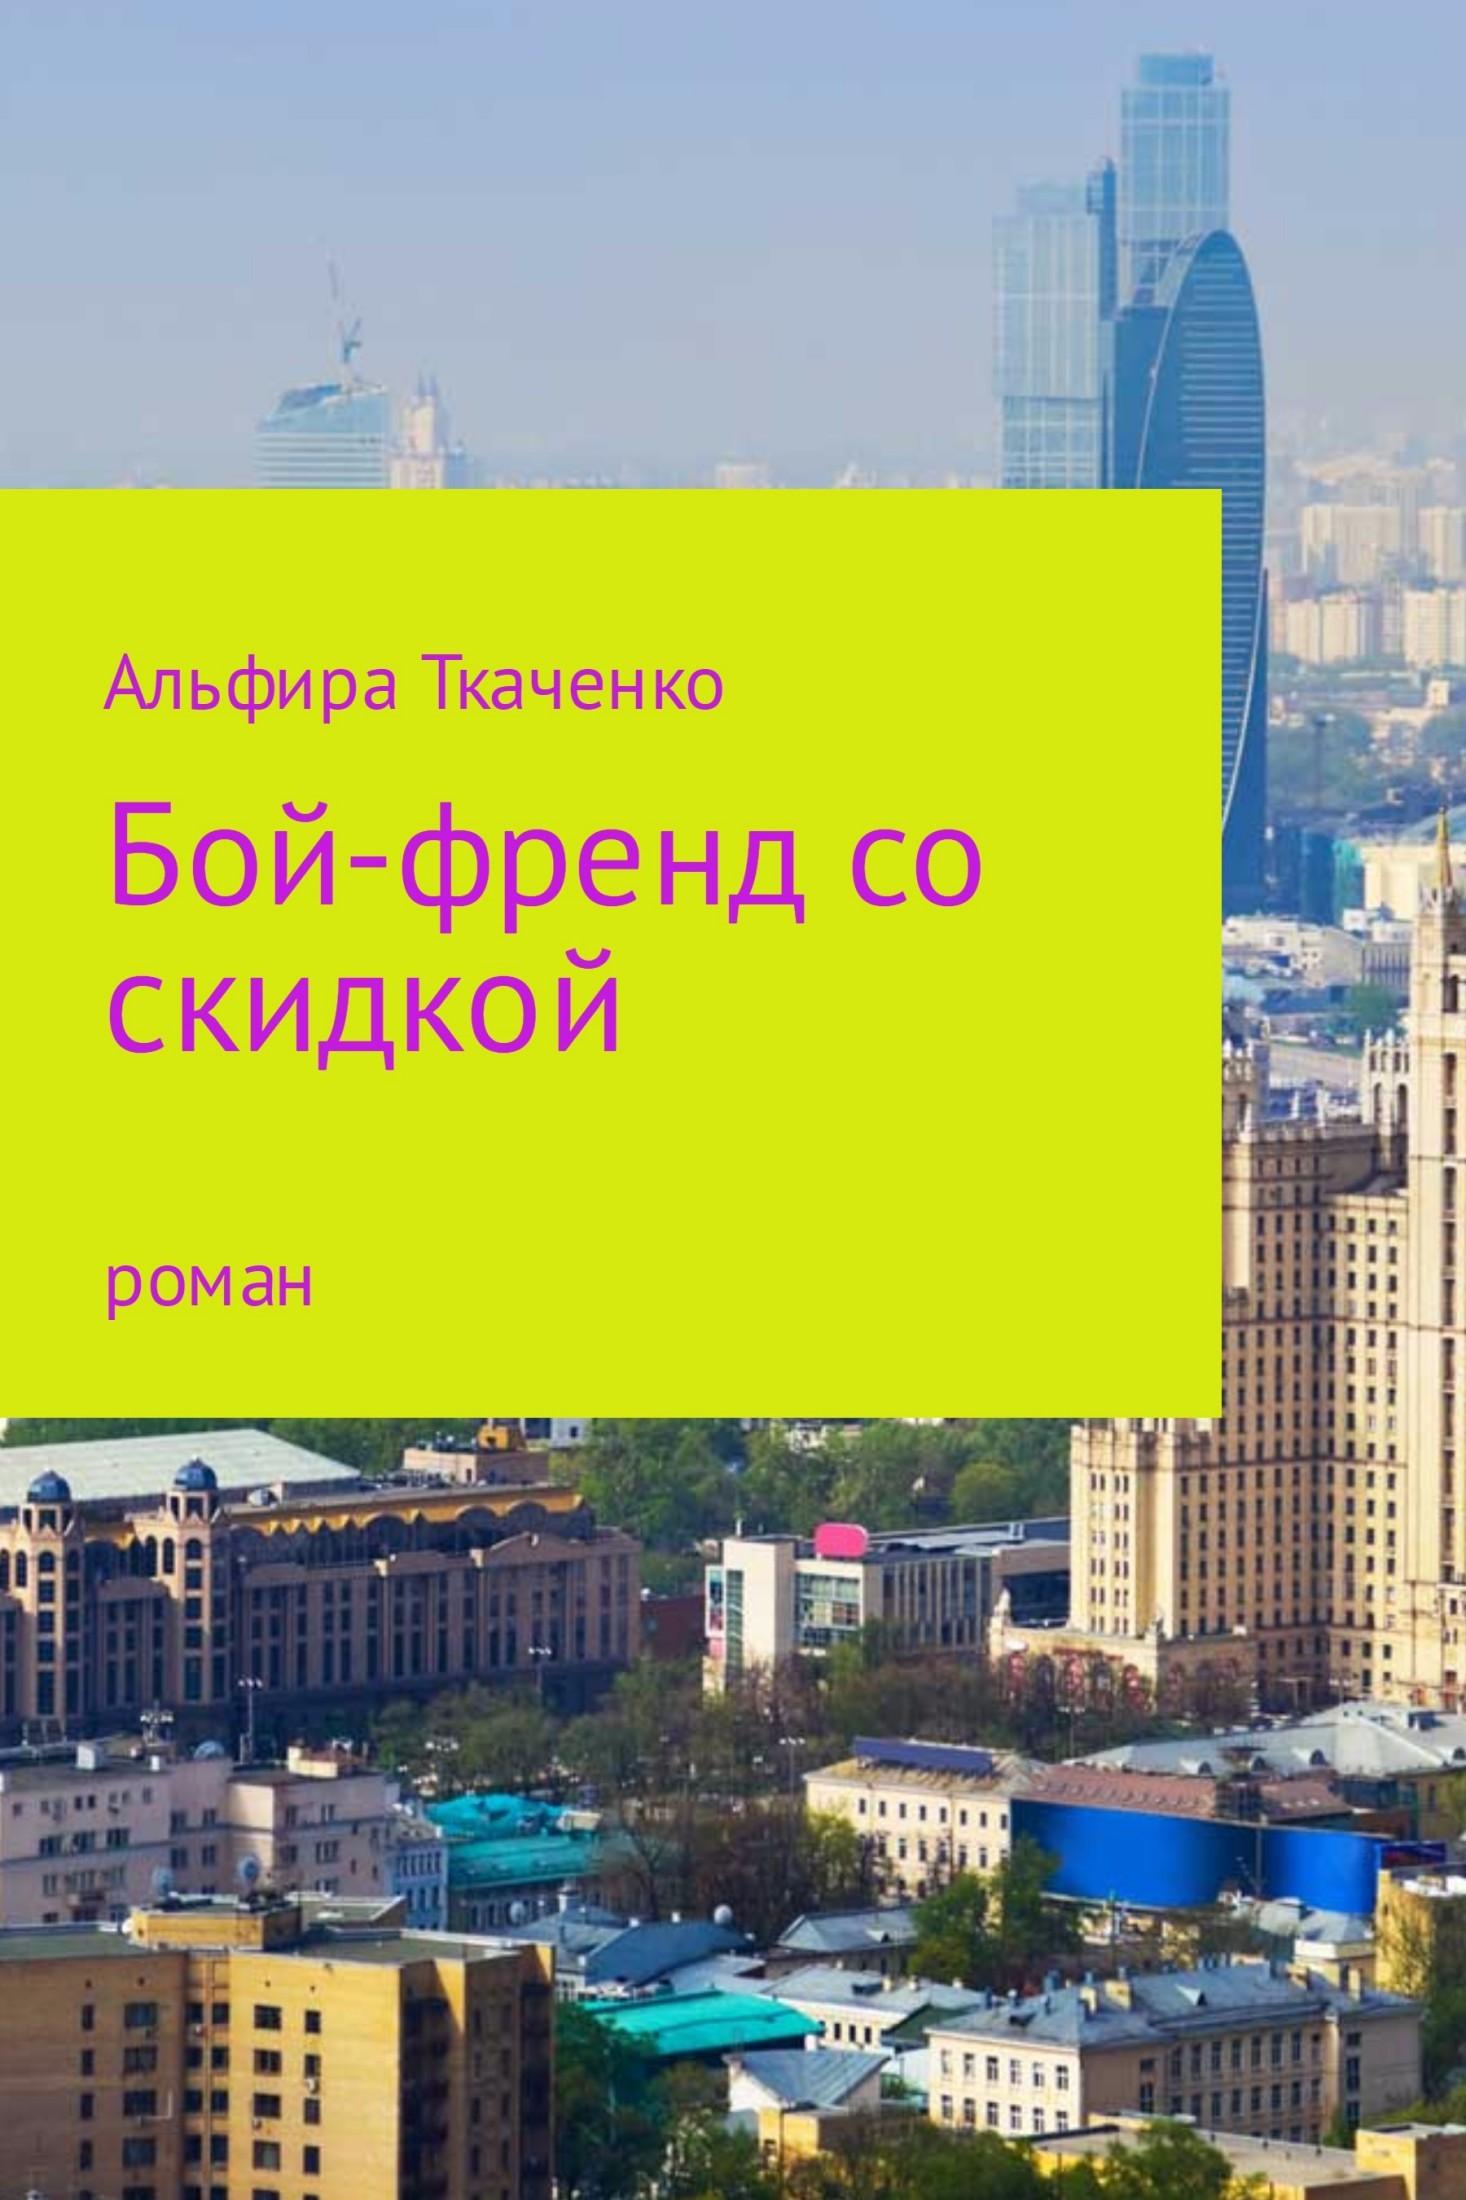 Альфира Федоровна Ткаченко Бойфренд со скидкой